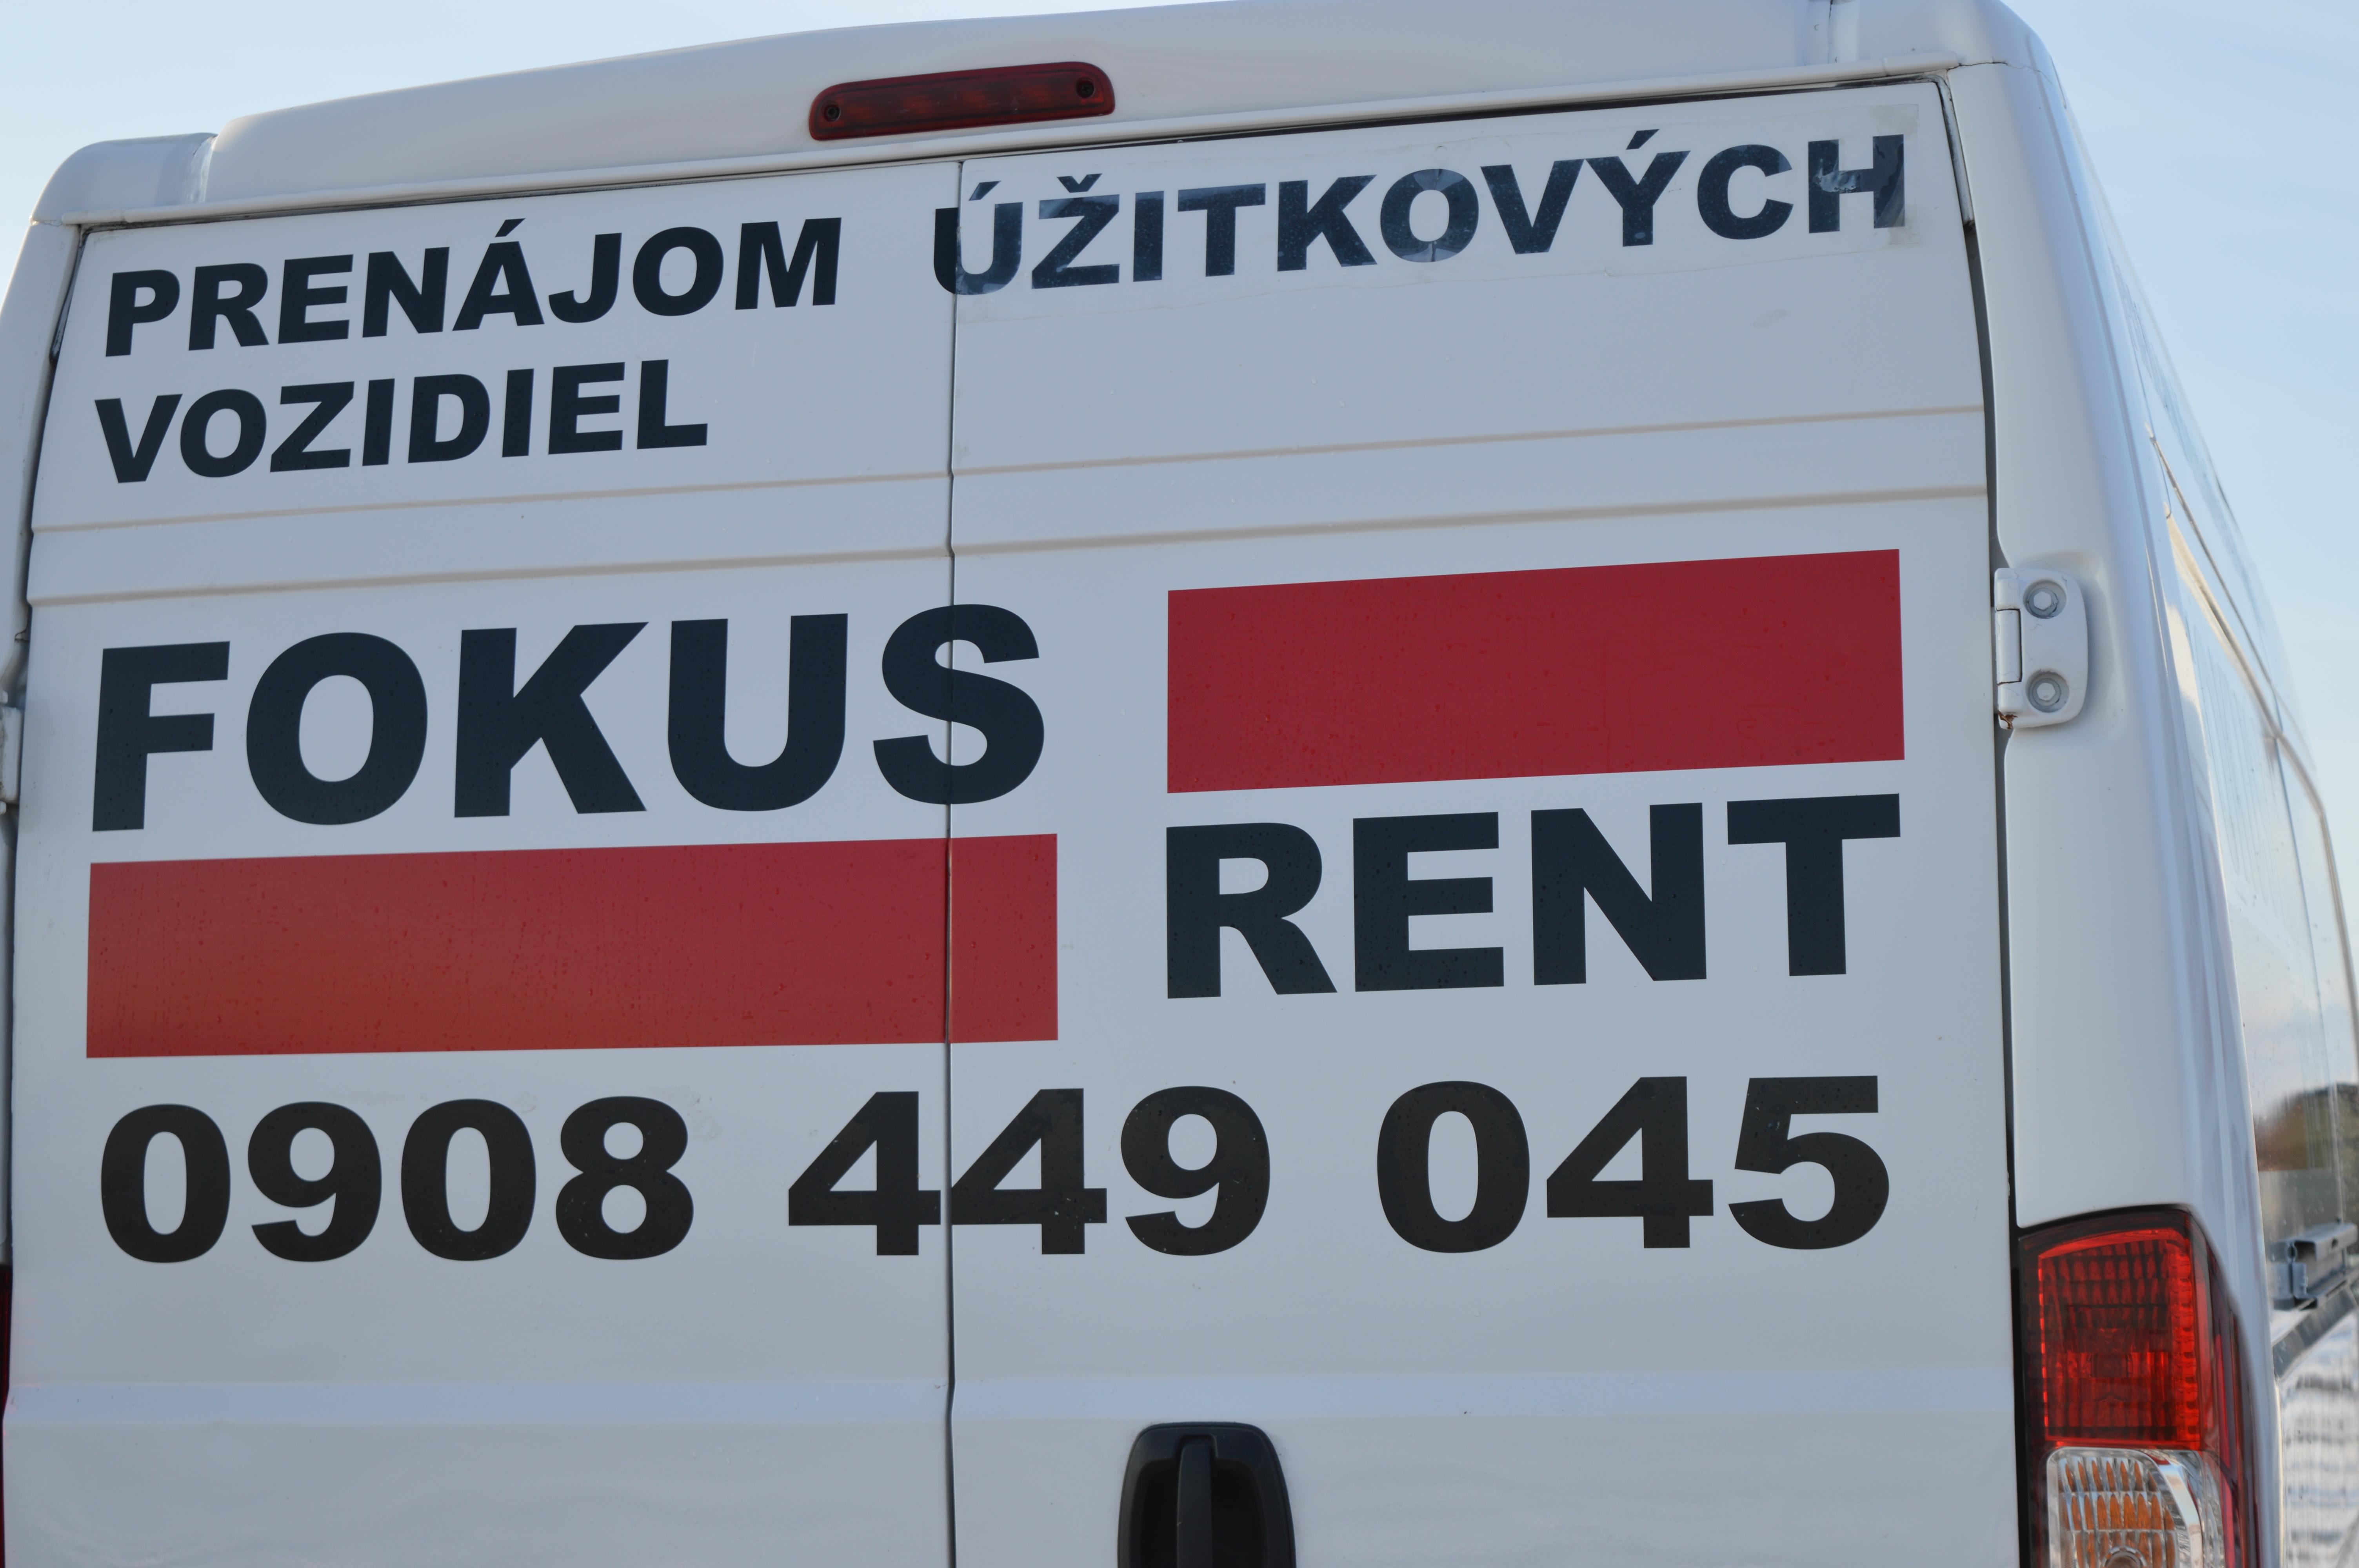 FOKUS RENT